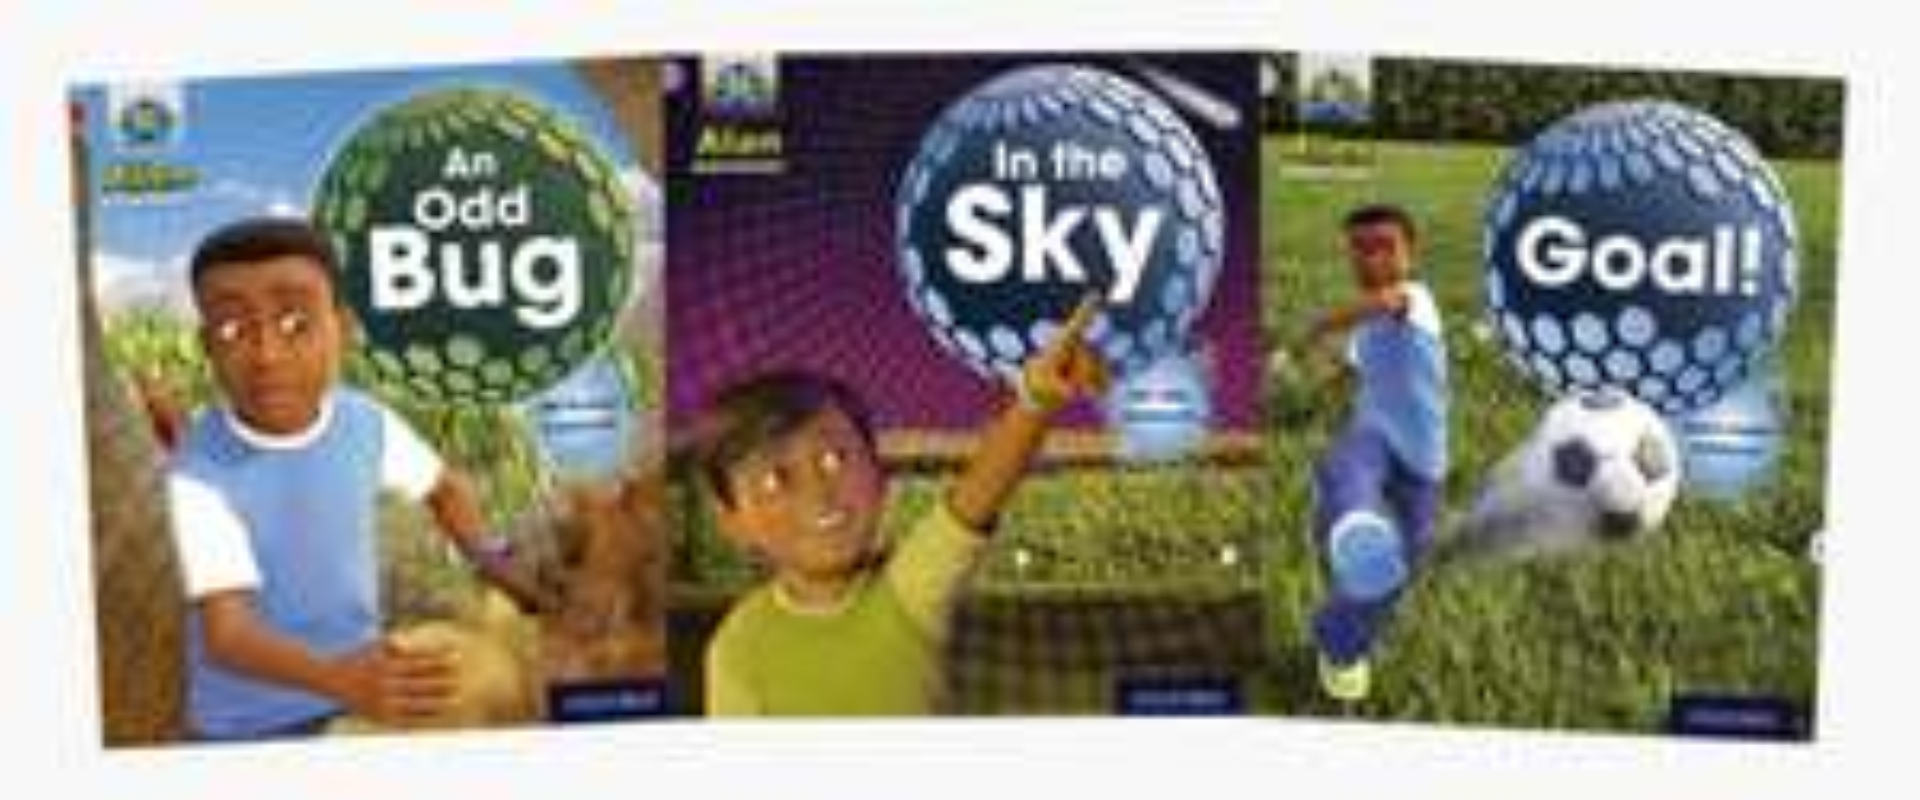 Project X Alien Adventures free ebooks - Oxford Owl